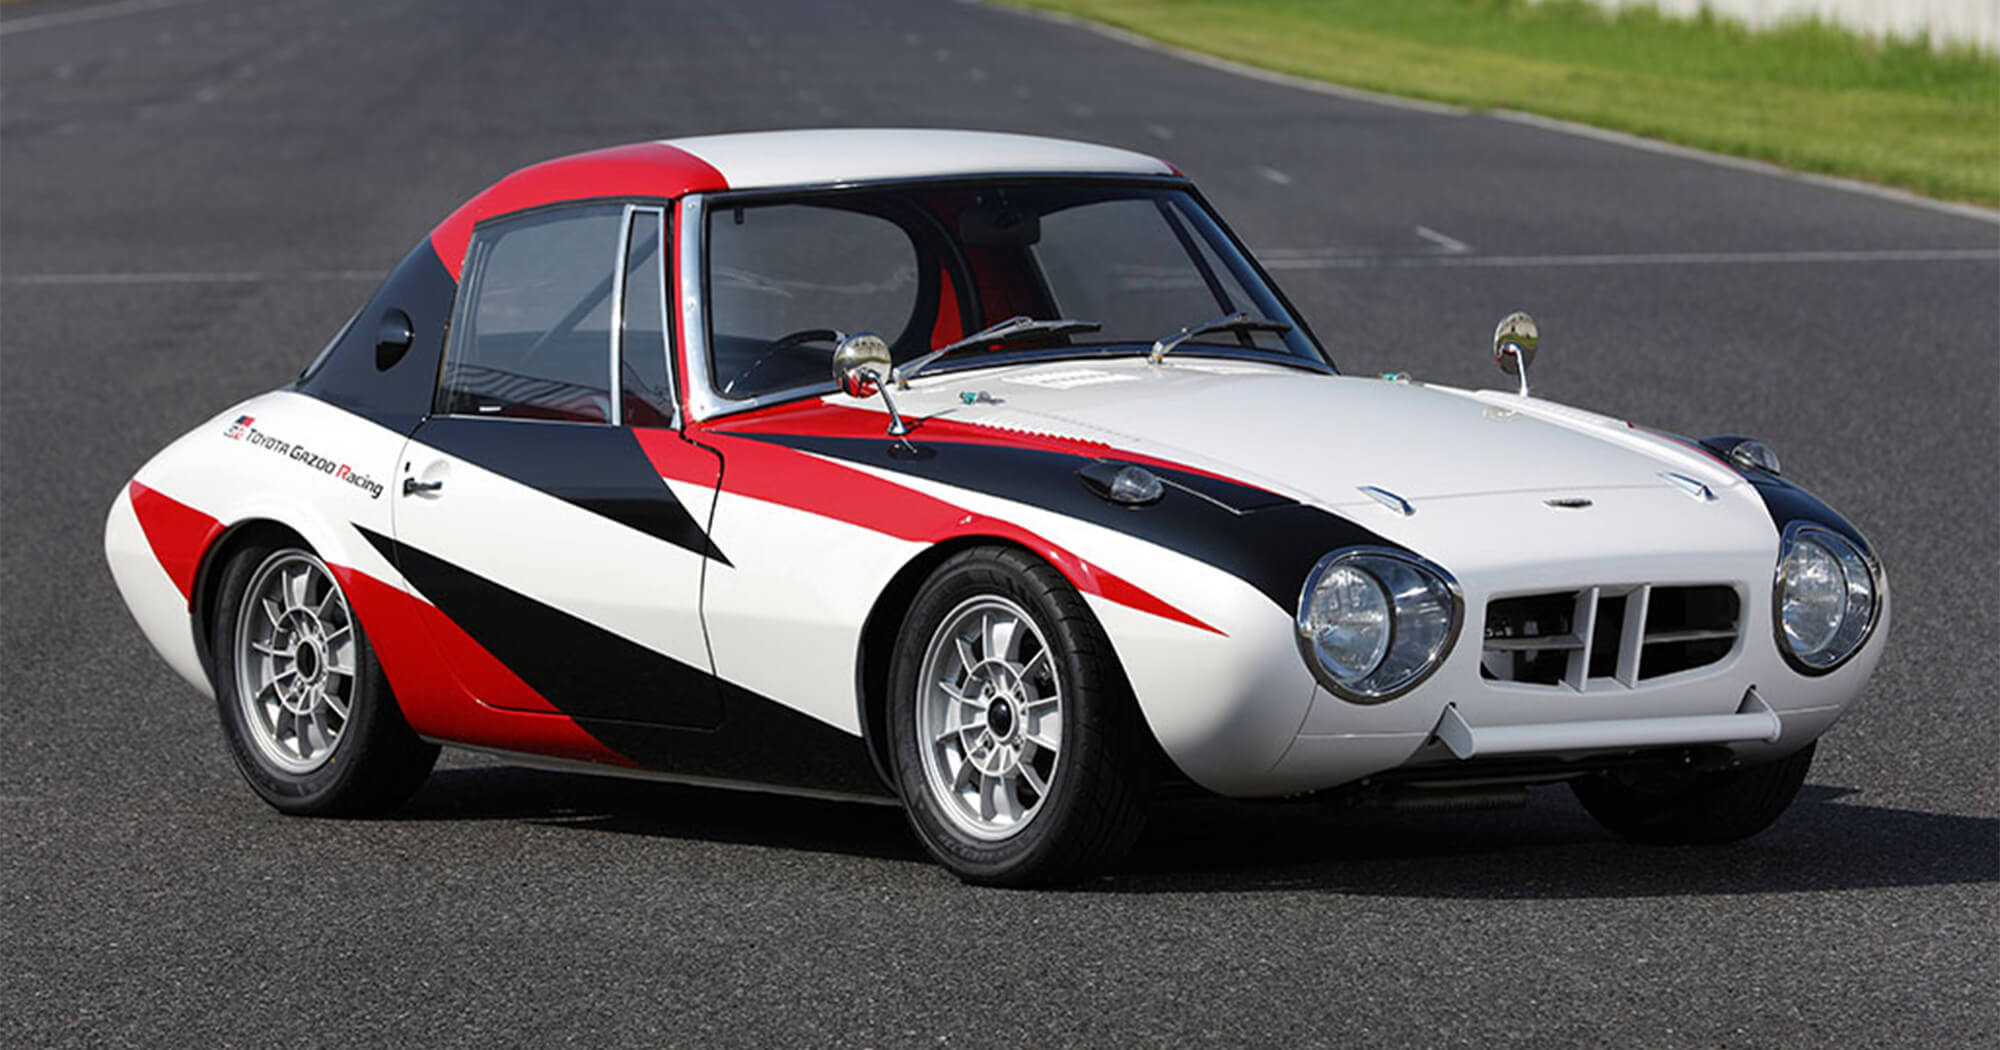 Coche del día: Toyota Sports 800 GR Concept